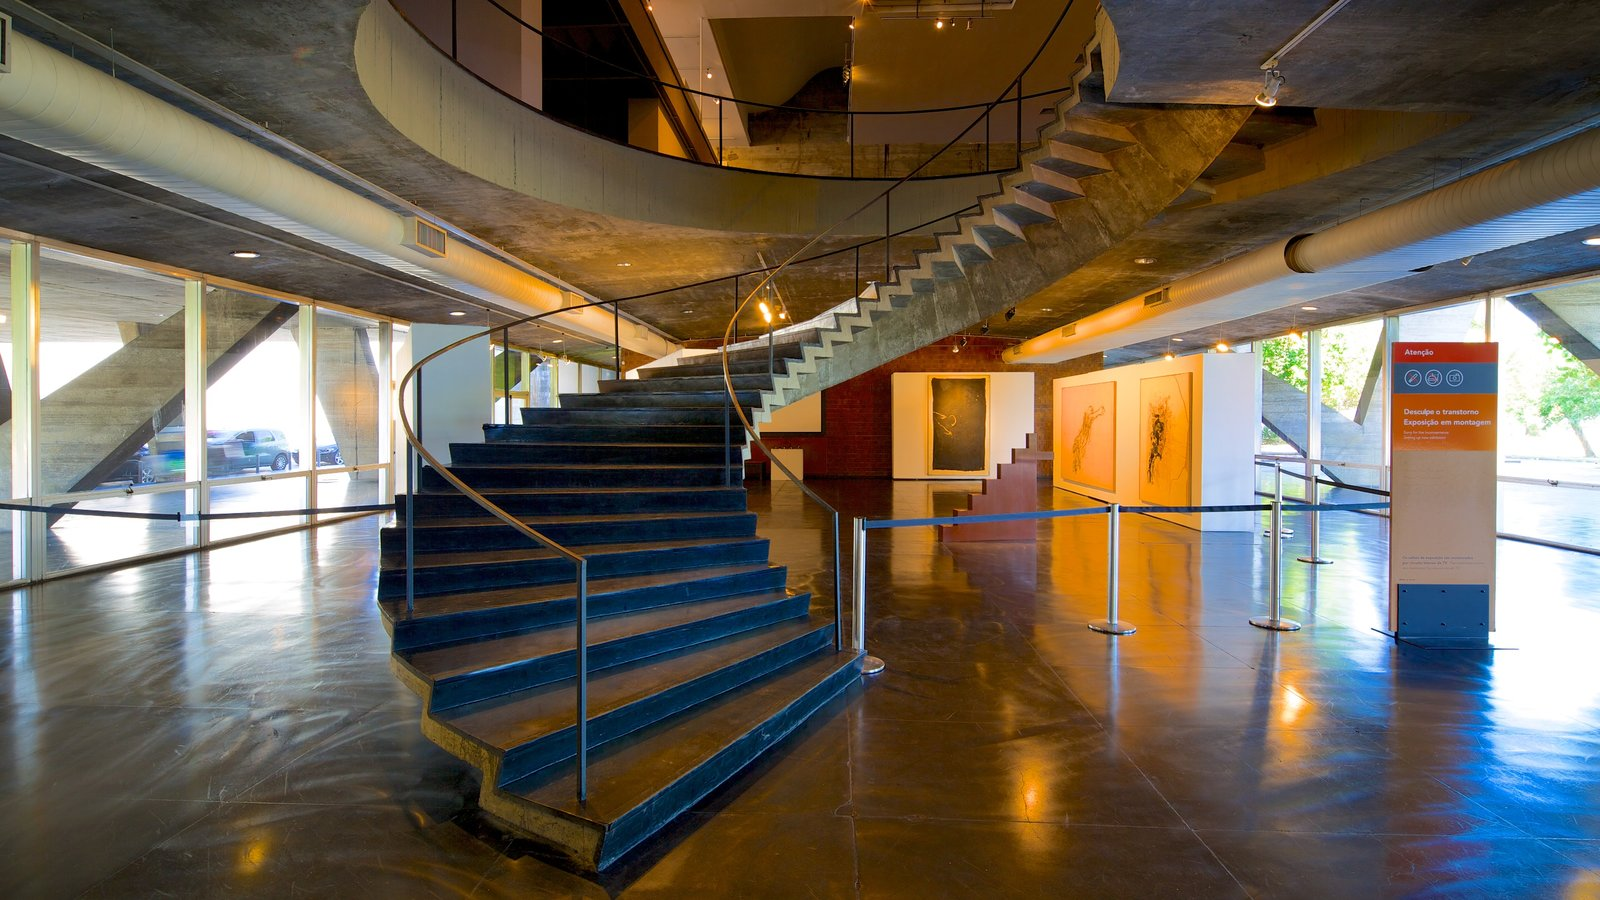 Museu de Arte Moderna caracterizando vistas internas